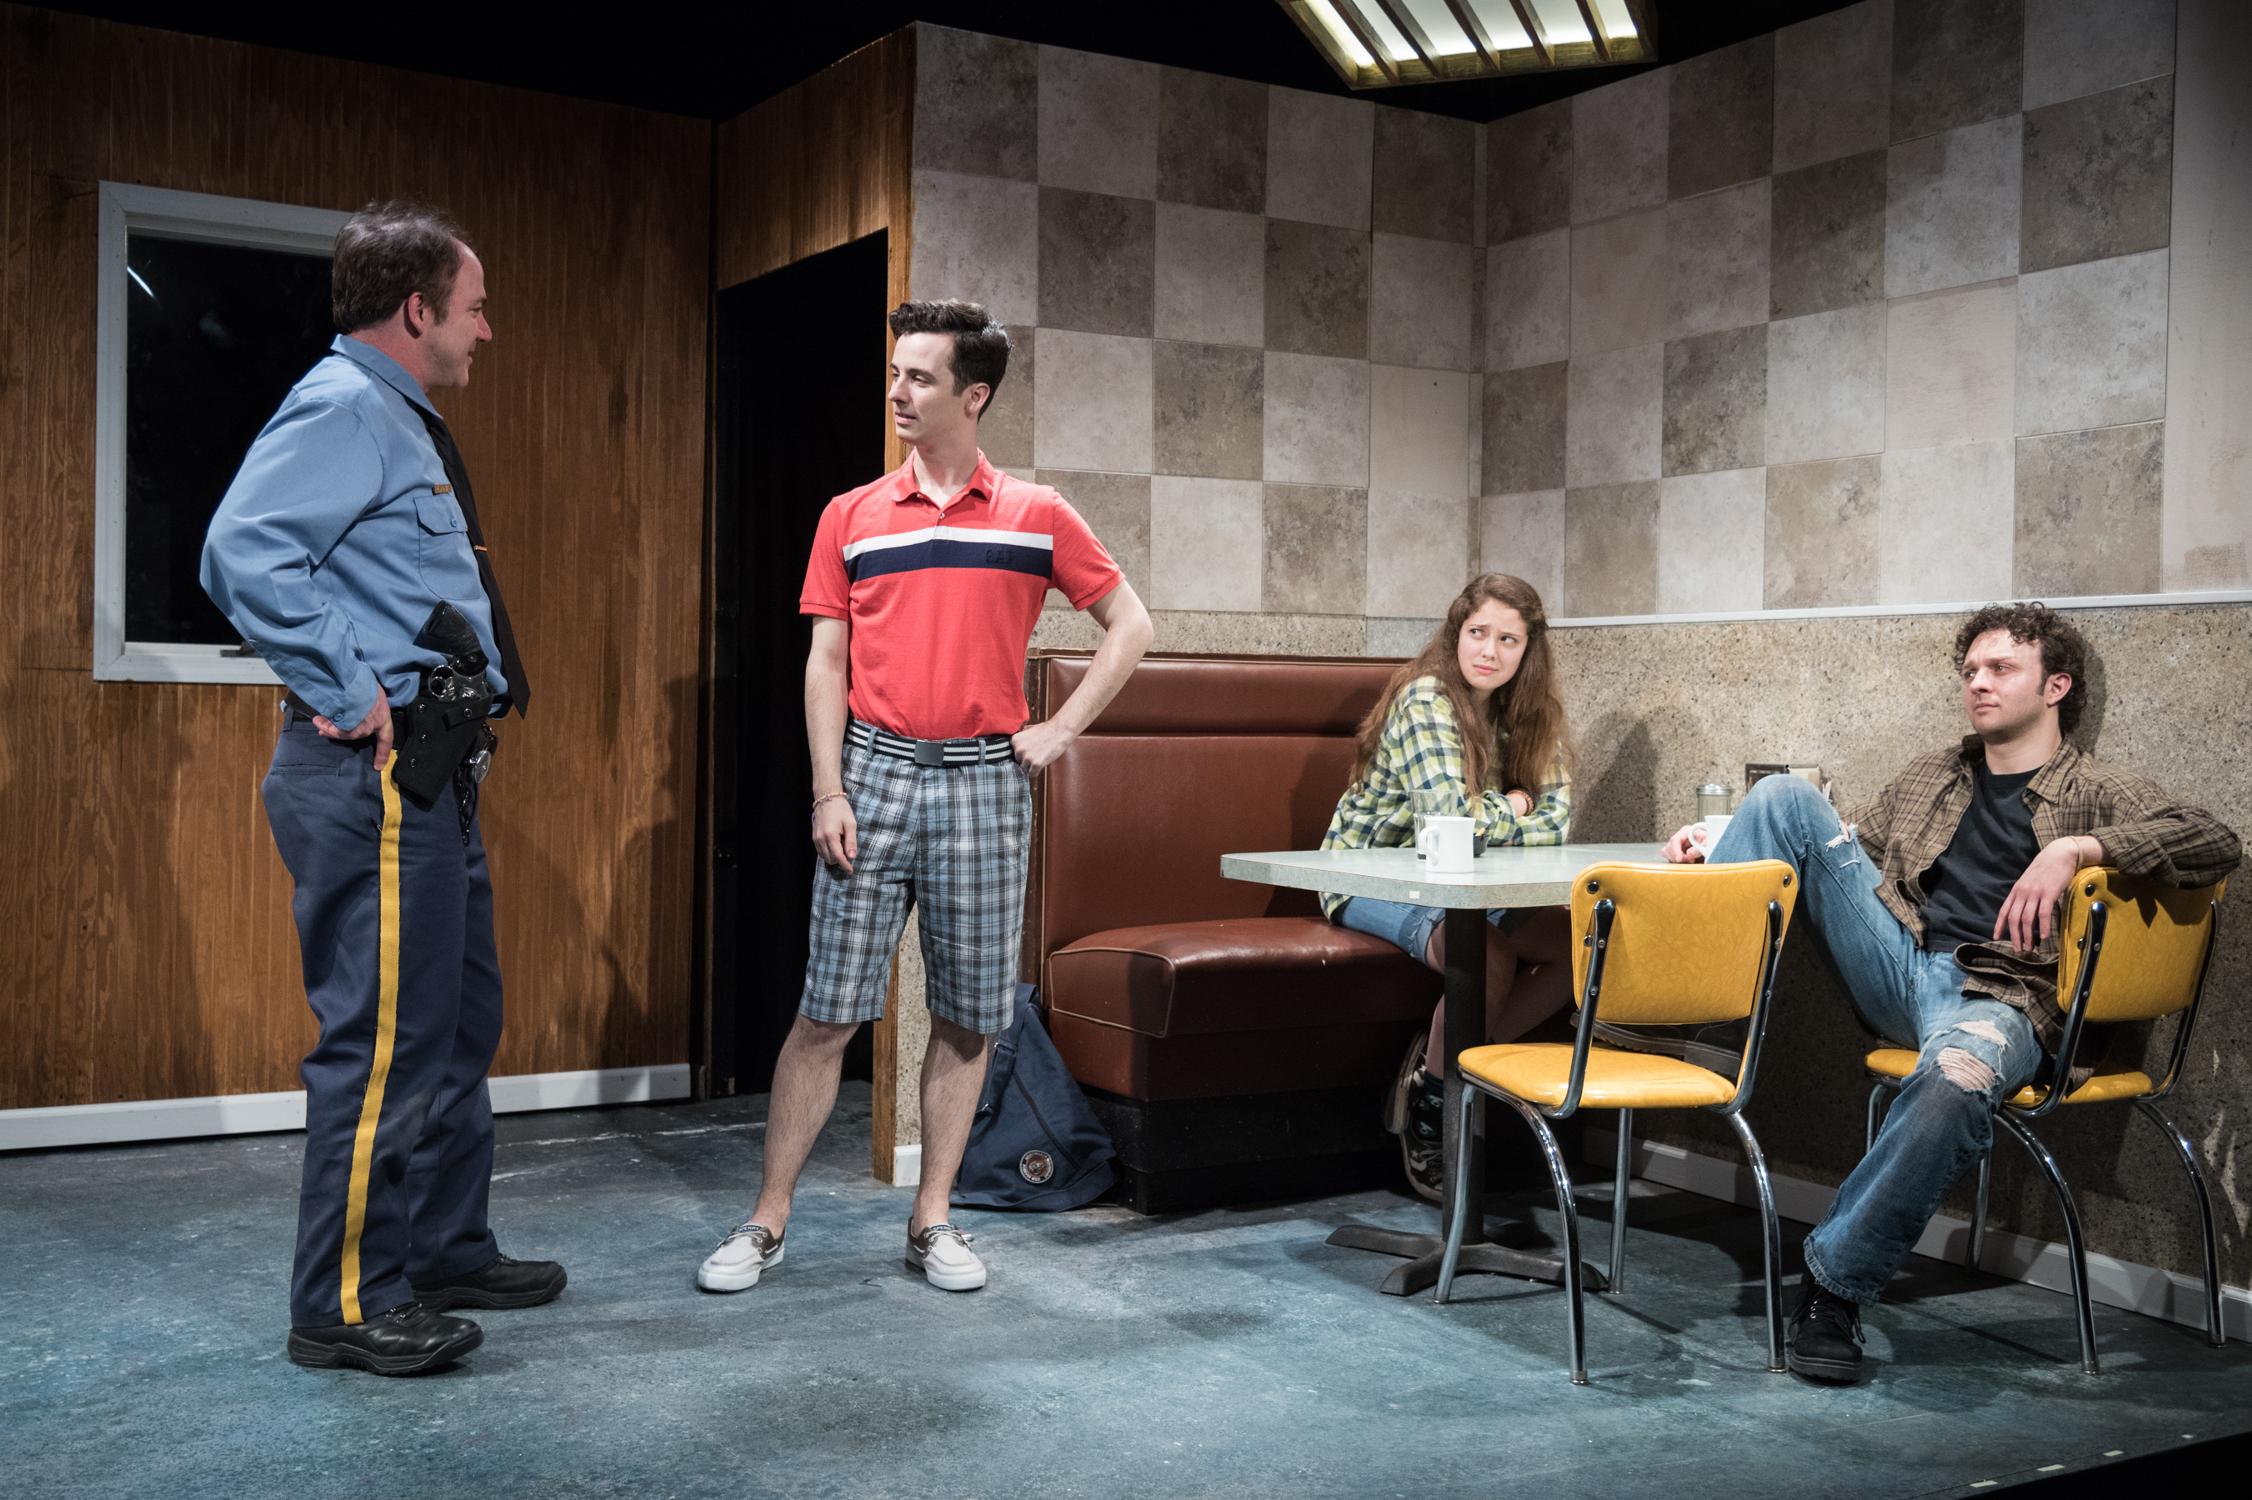 Matthew Lawler as Officer Dan, Sean Patrick Monahan as Pete, Rachel Franco as Tara, James Kautz as Adam. Photo credit: Russ Rowland